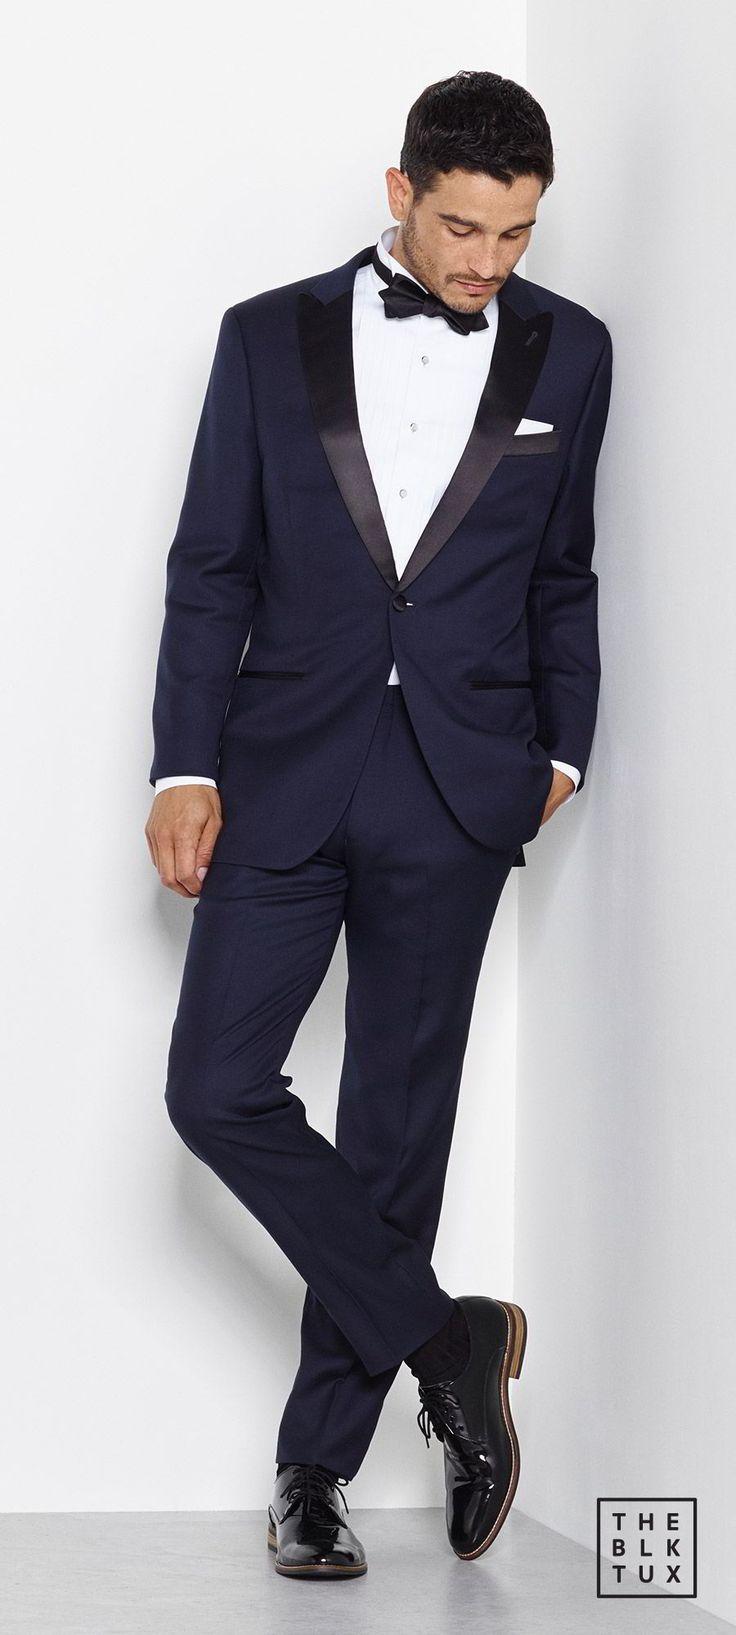 the black tux 2017 online tuxedo rental service the midnight blue tuxedo groommen best man style